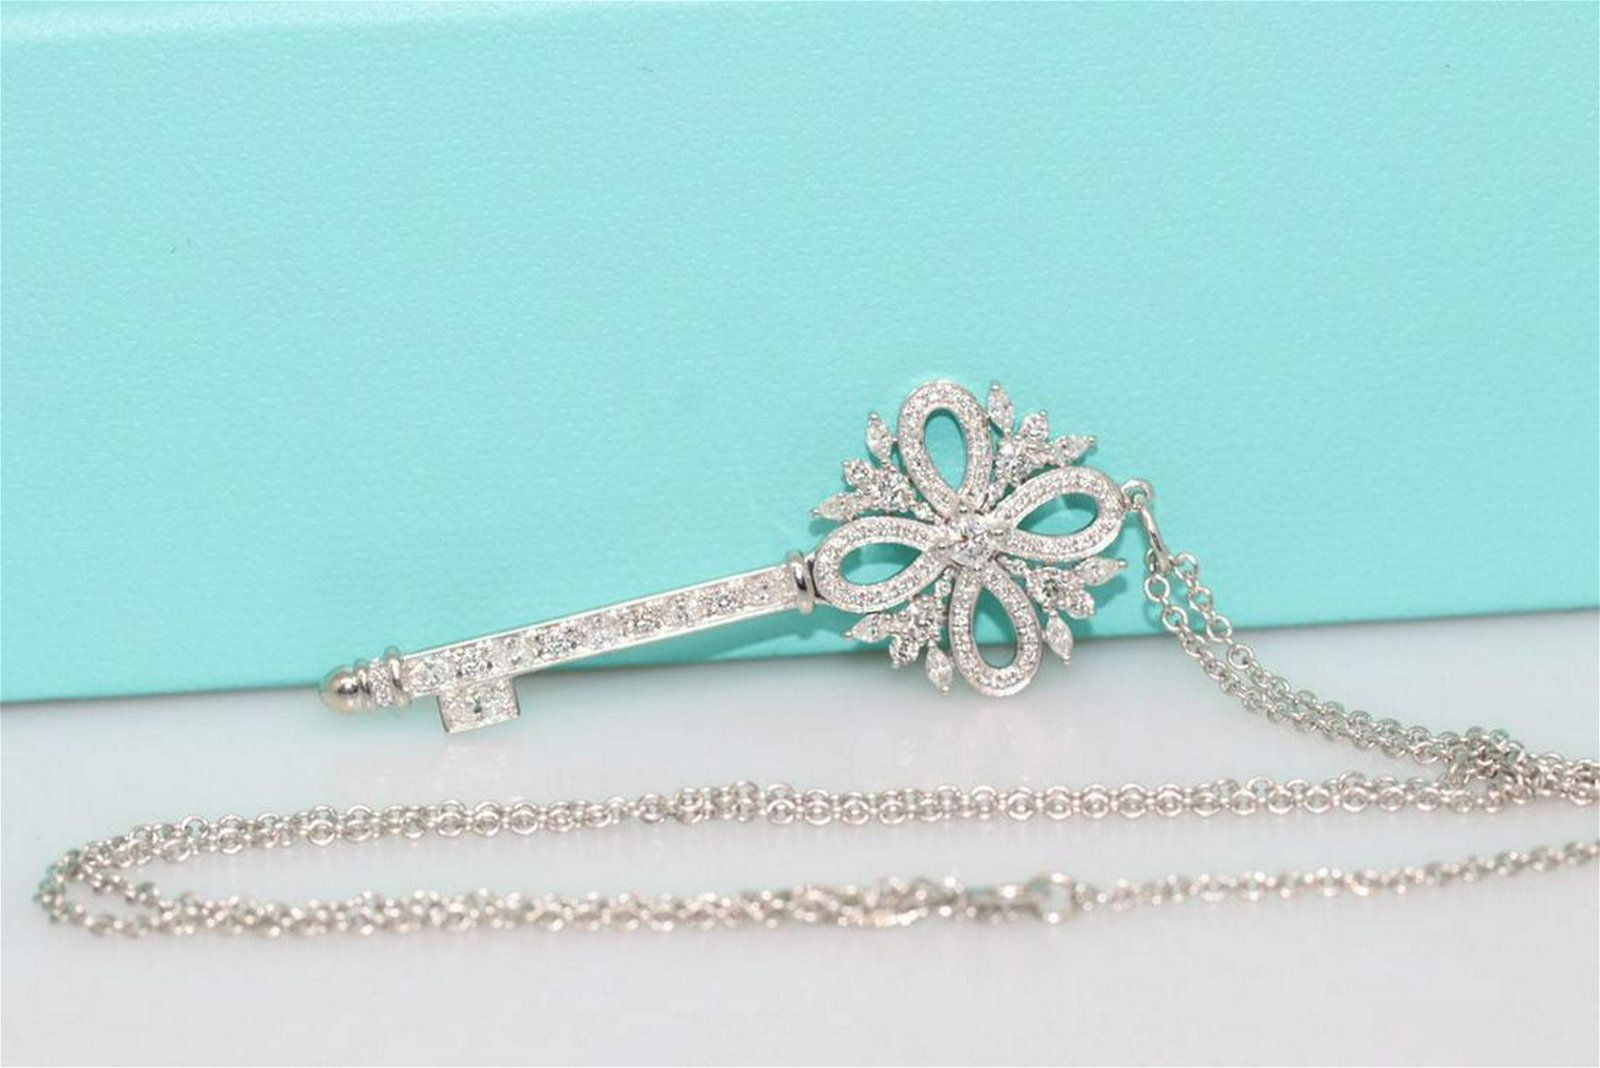 Tiffany & Co. Victoria Key Pendant